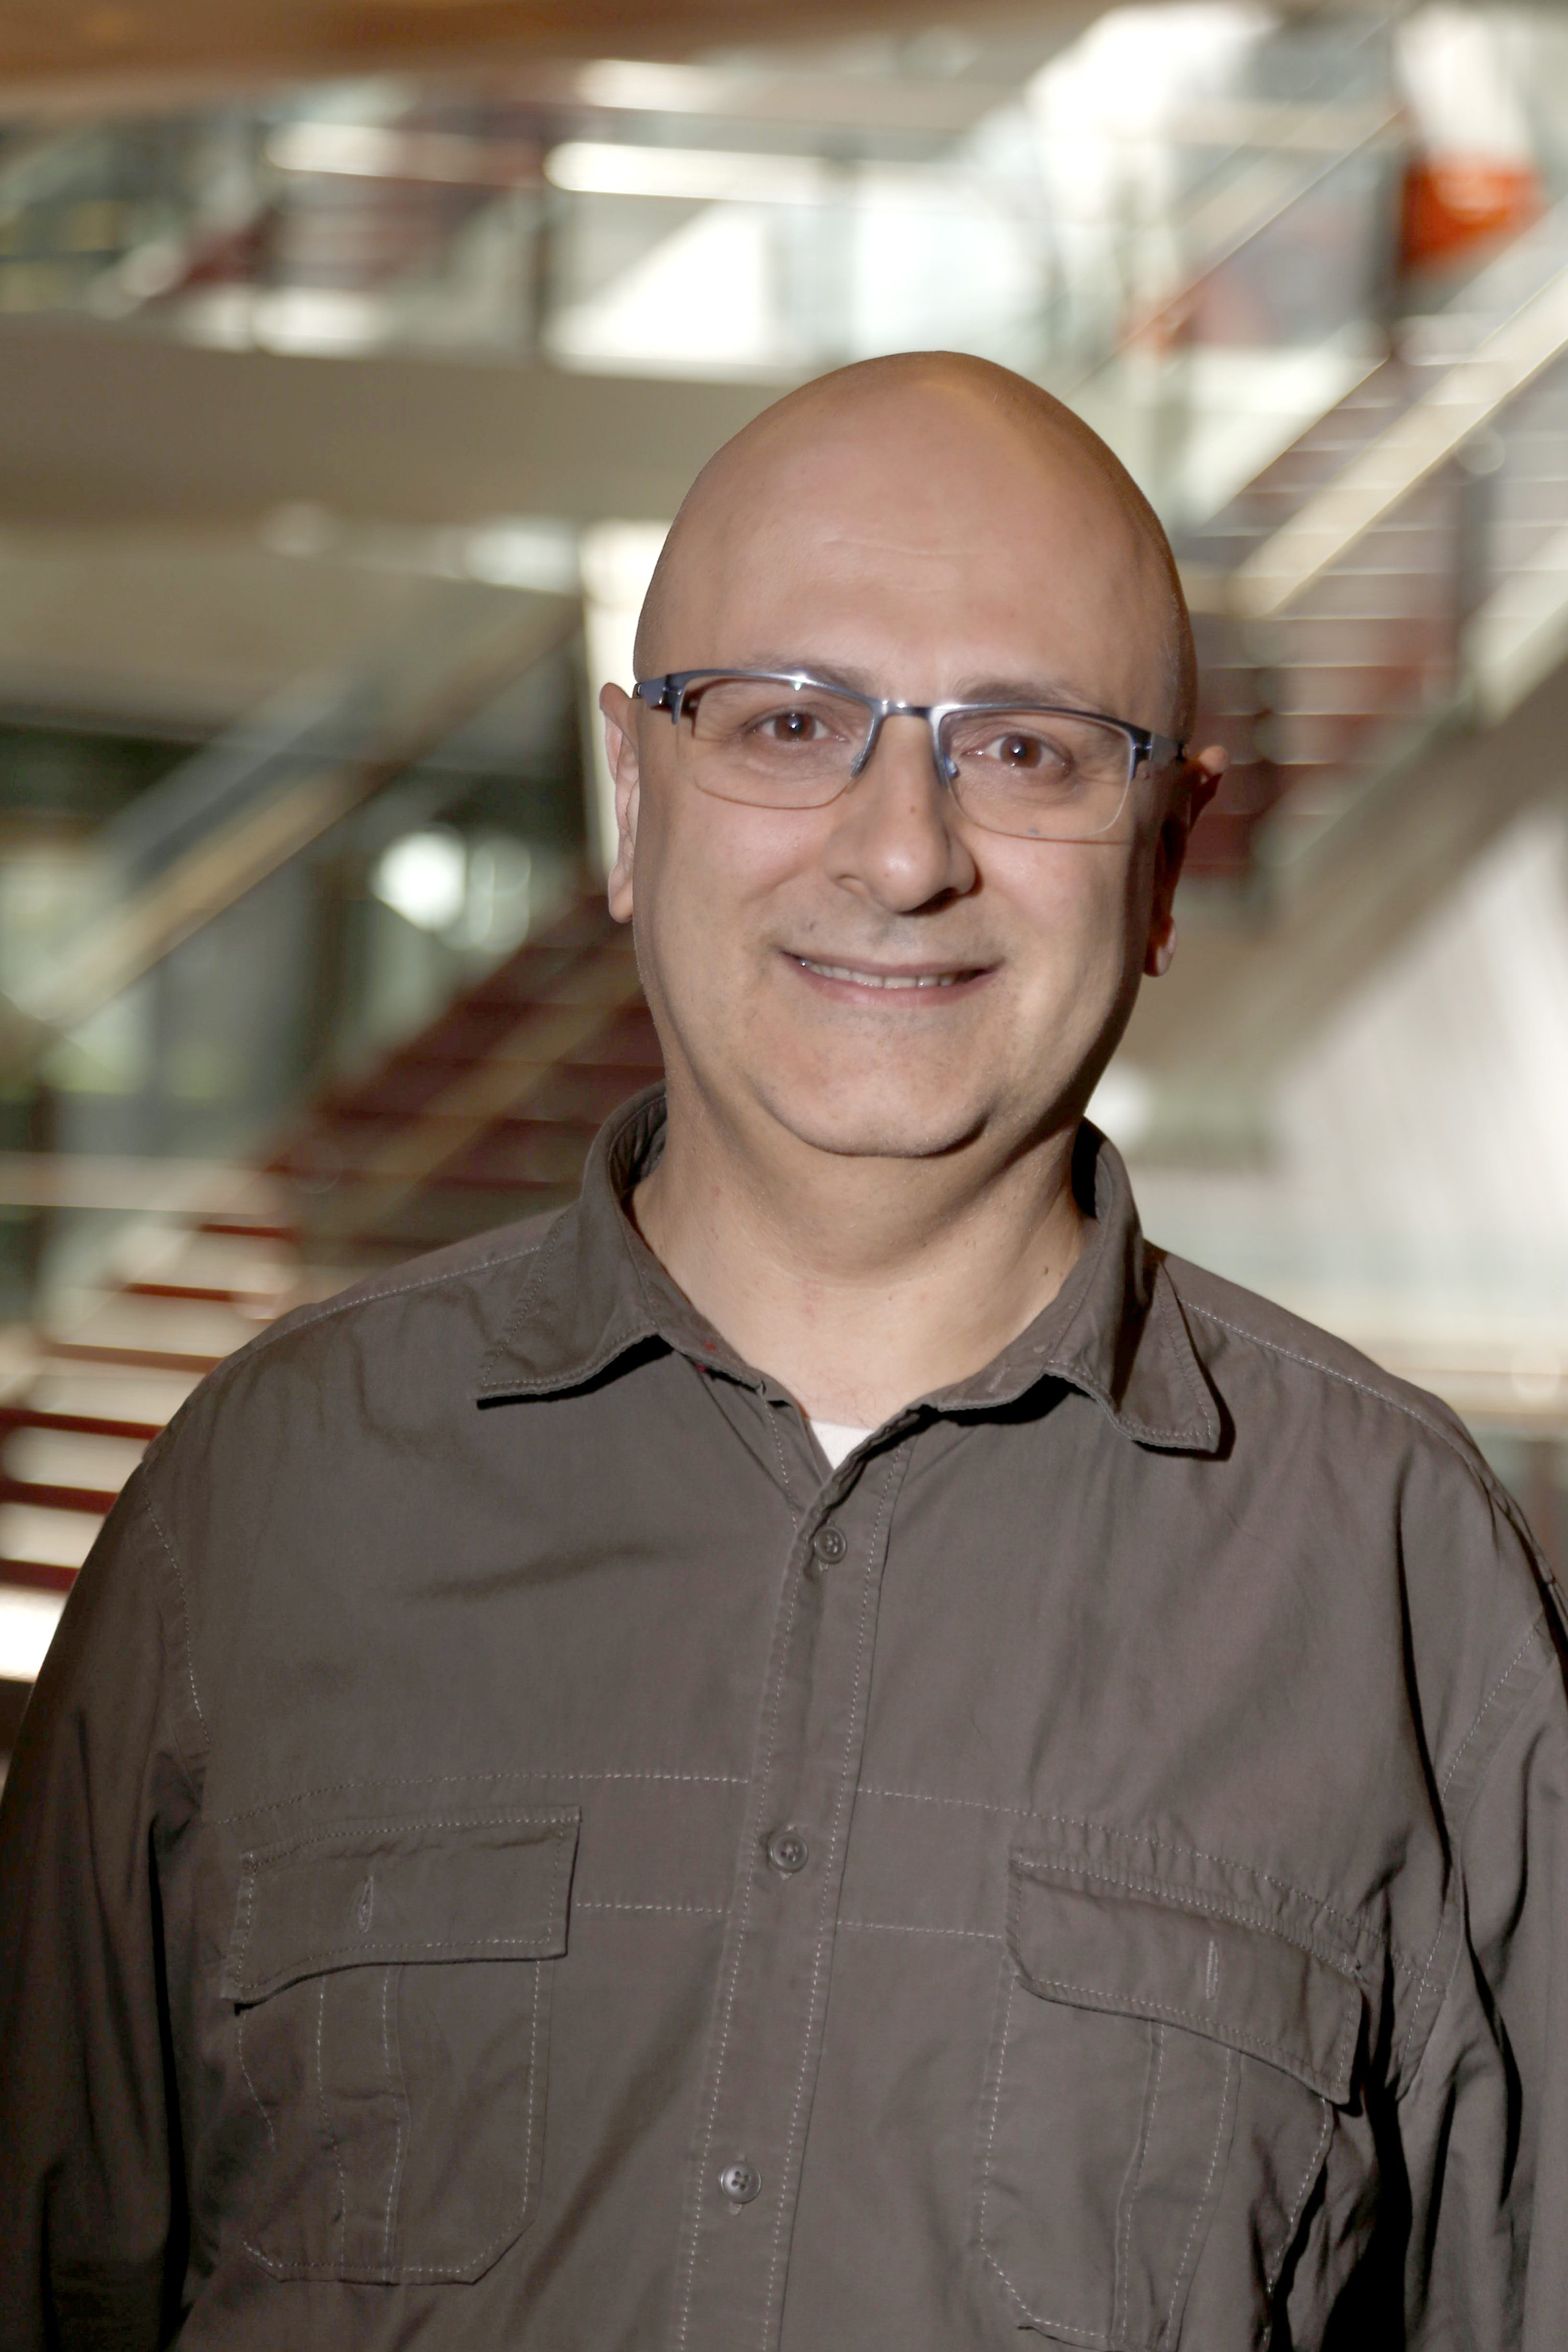 Emanuele Viterbo